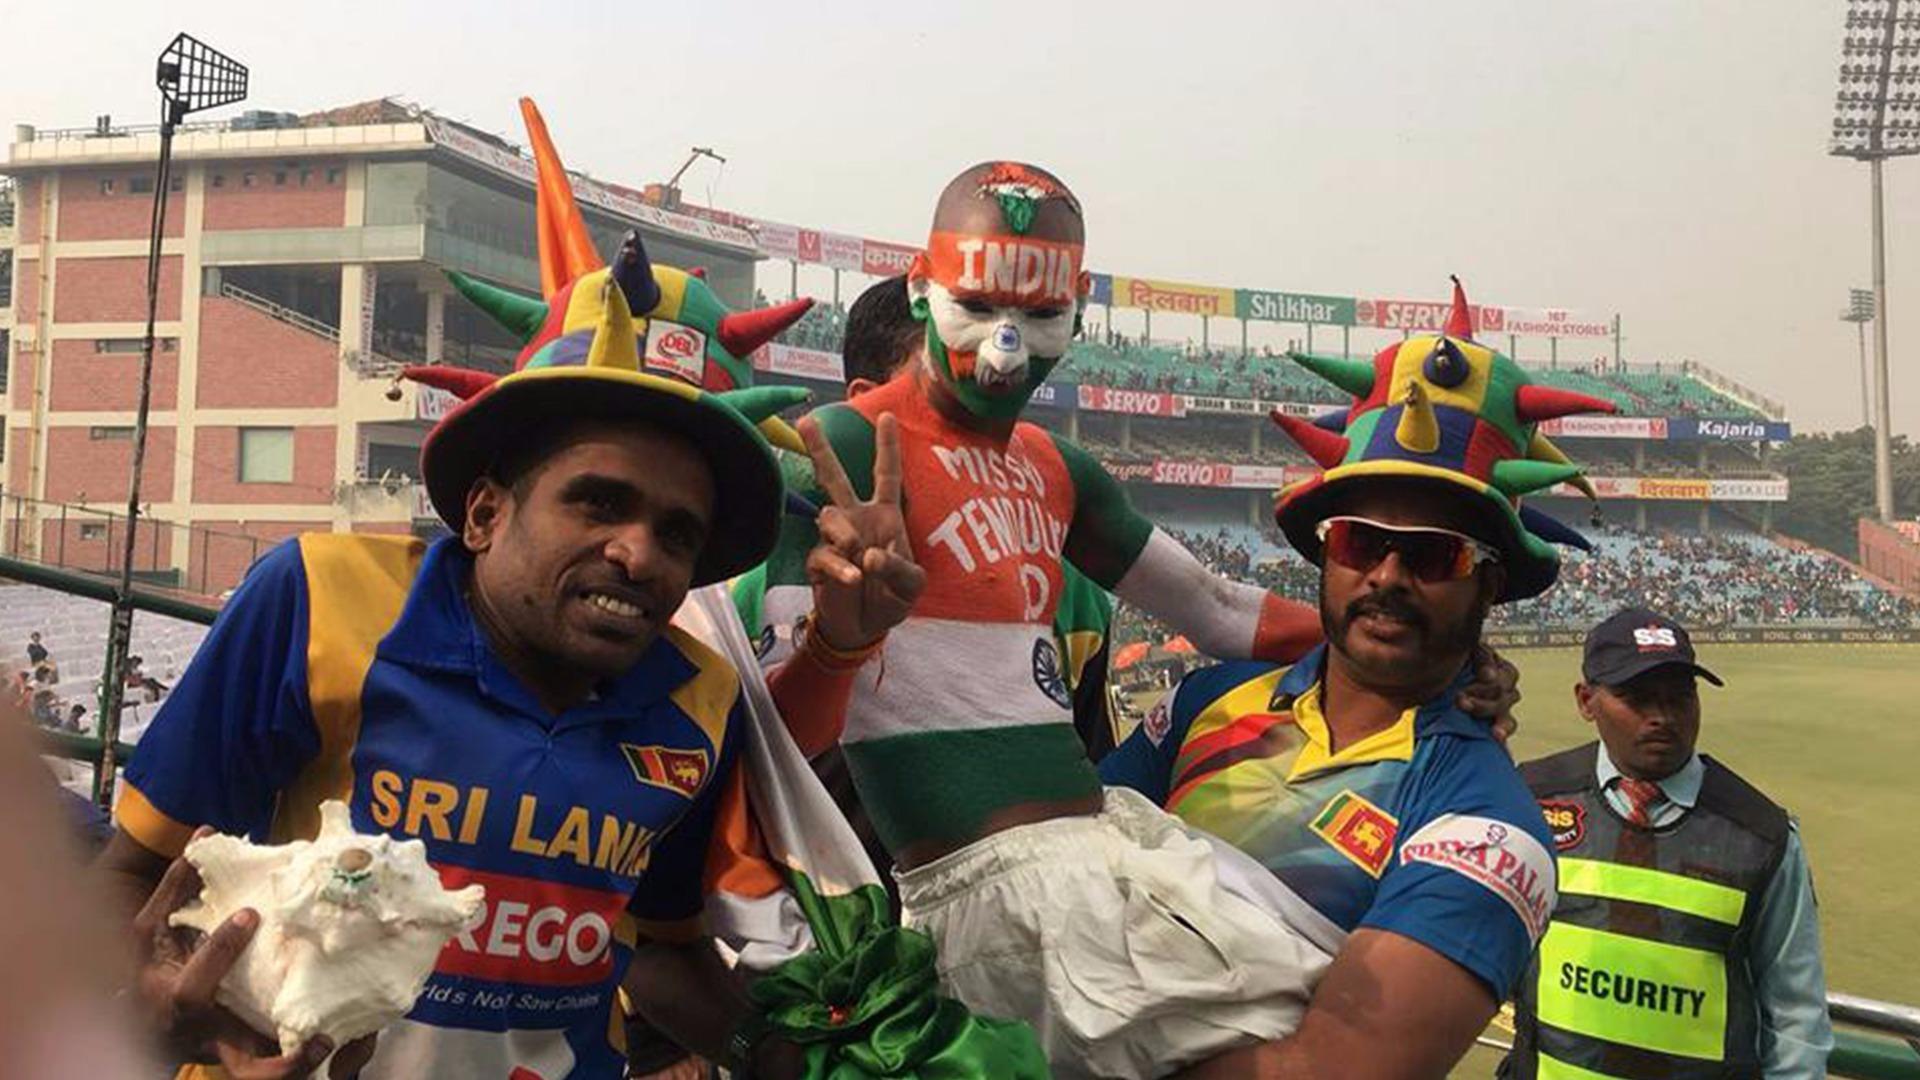 Srilankan Fan Nilam with Sudhir Kumar